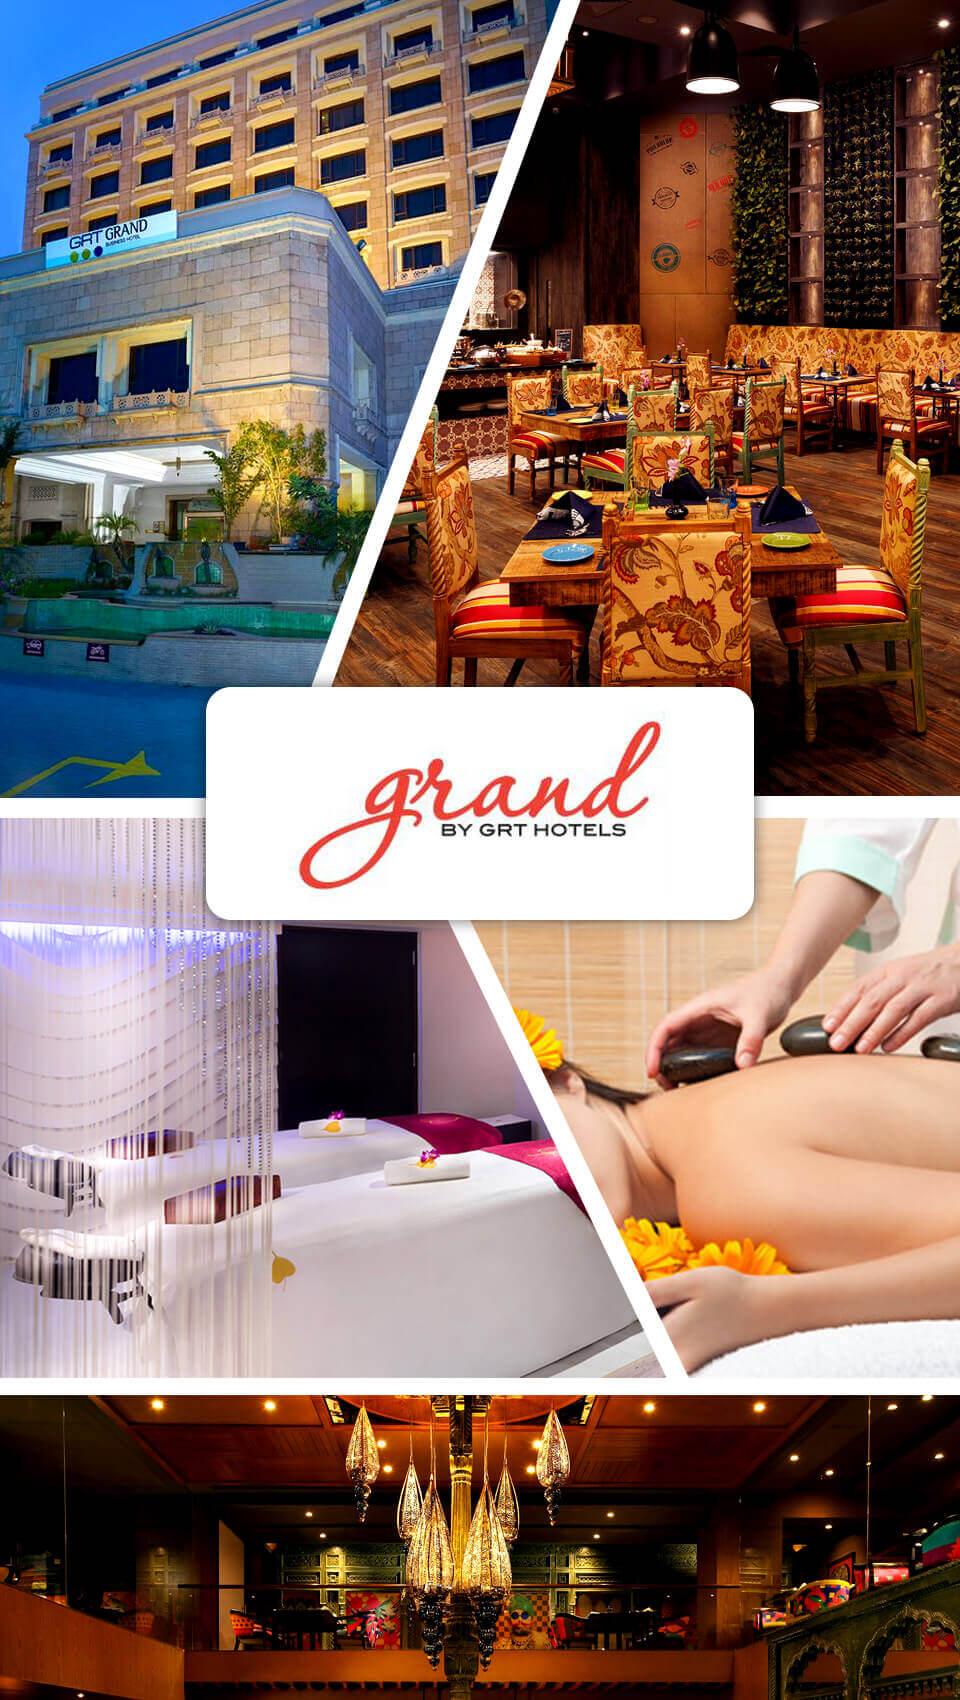 GRT GRAND - grt - buzztm - Luxury Business Hotels in Chennai T Nagar - GRT Hotel Chennai, Luxury Business Hotels in Chennai T Nagar, Grand by GRT Hotels, Best Luxury hotel in Chennai, Hotel Booking deals in chennai, Book luxury hotel rooms in chennai, Luxuries Spa packages in chennai, hotel booking in tamilnadu, Book Beach resorts in chennai Hotel room booking in chennai, Book luxury Hotel packages in chennai, Best hotel bookings in chennai, Best discounts on hotels in tamilnadu, hotel booking in chennai, Best luxury hotels in Chennai